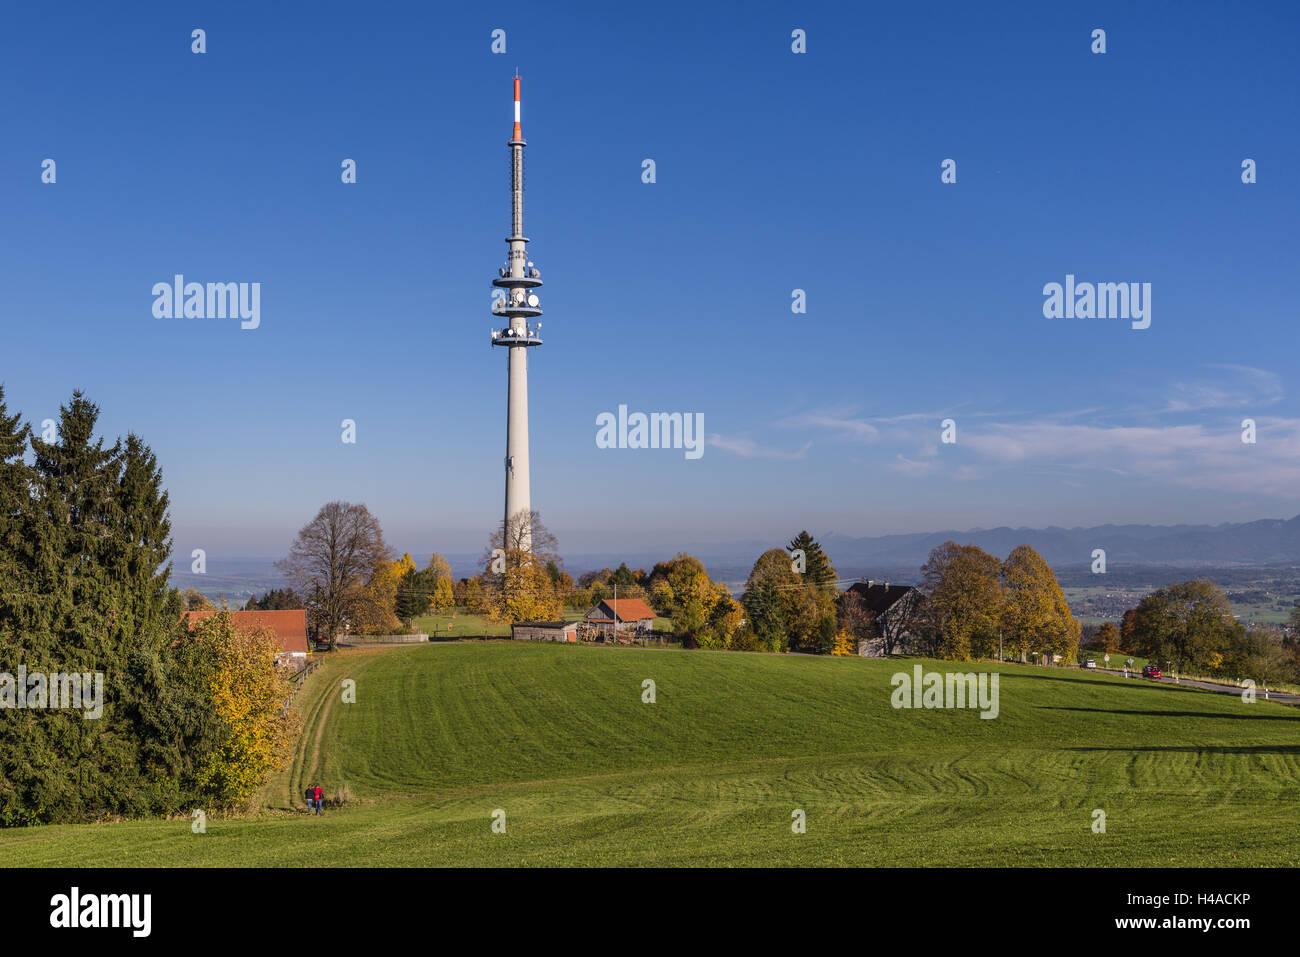 Germany, Bavaria, Upper Bavaria, priest's angle, mountain Hohenpeissen, mast in the high mountain Peissen, - Stock Image